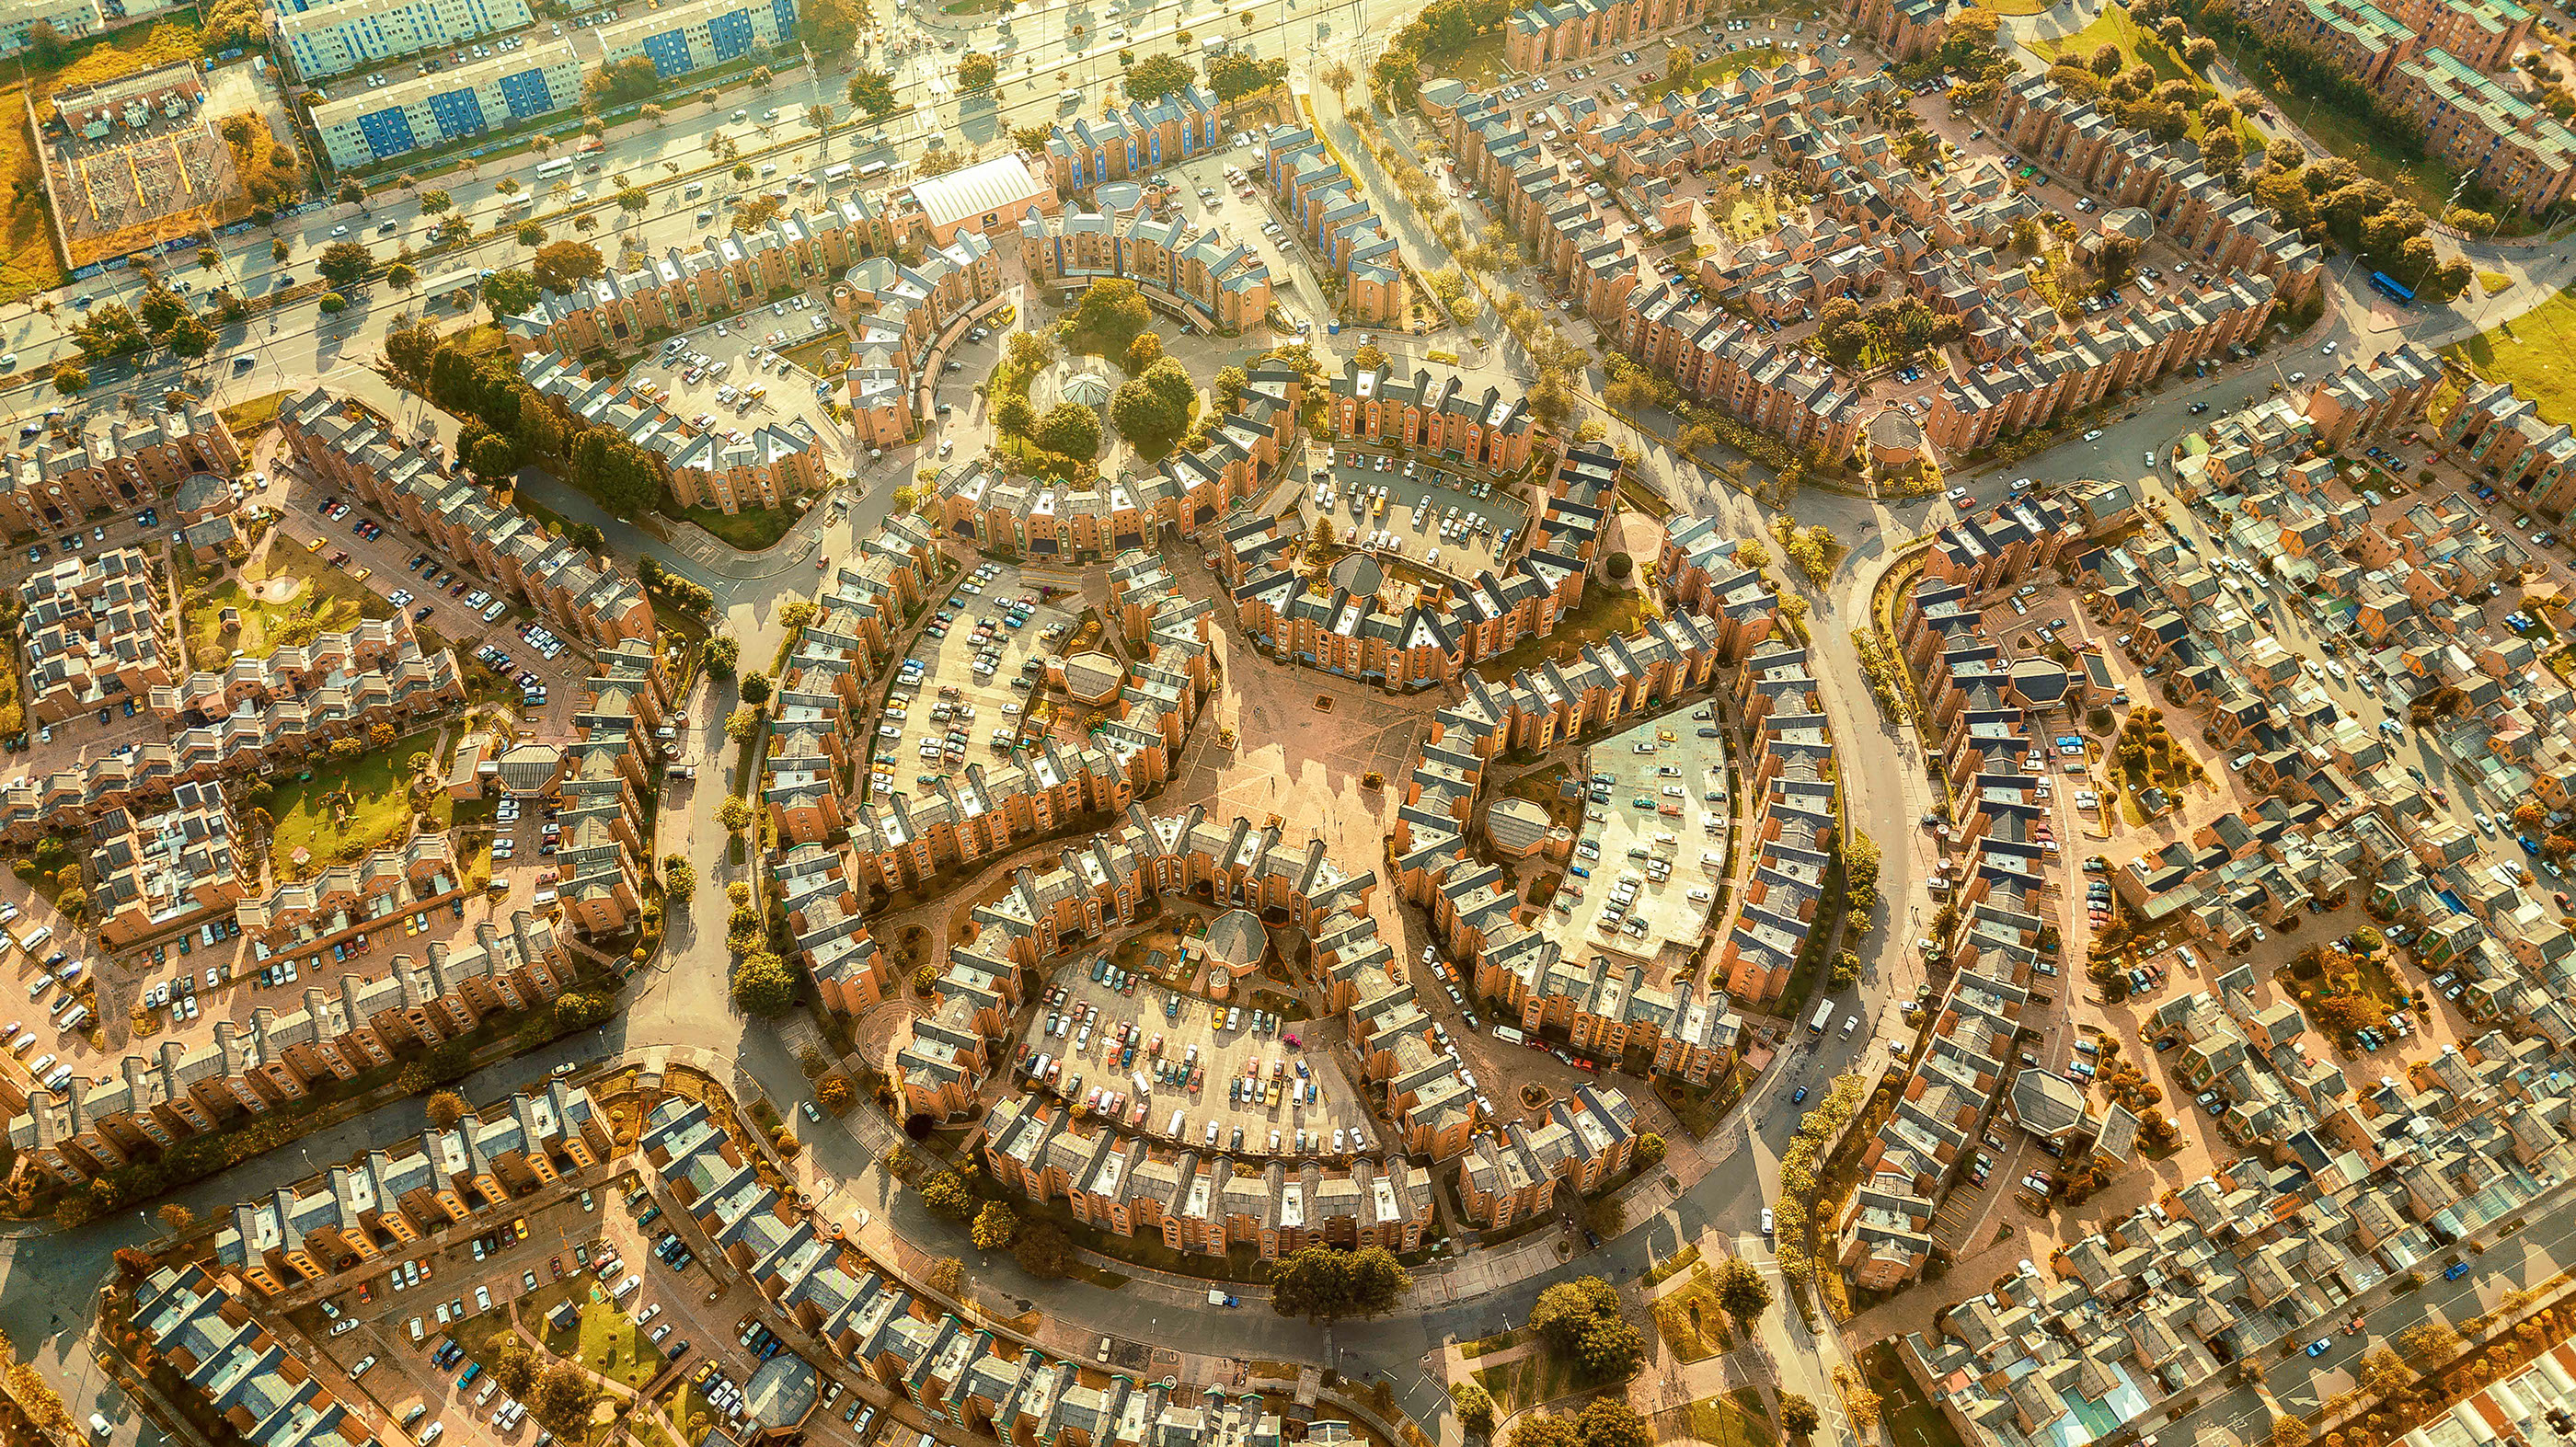 Drone Photography: Aerial Facades